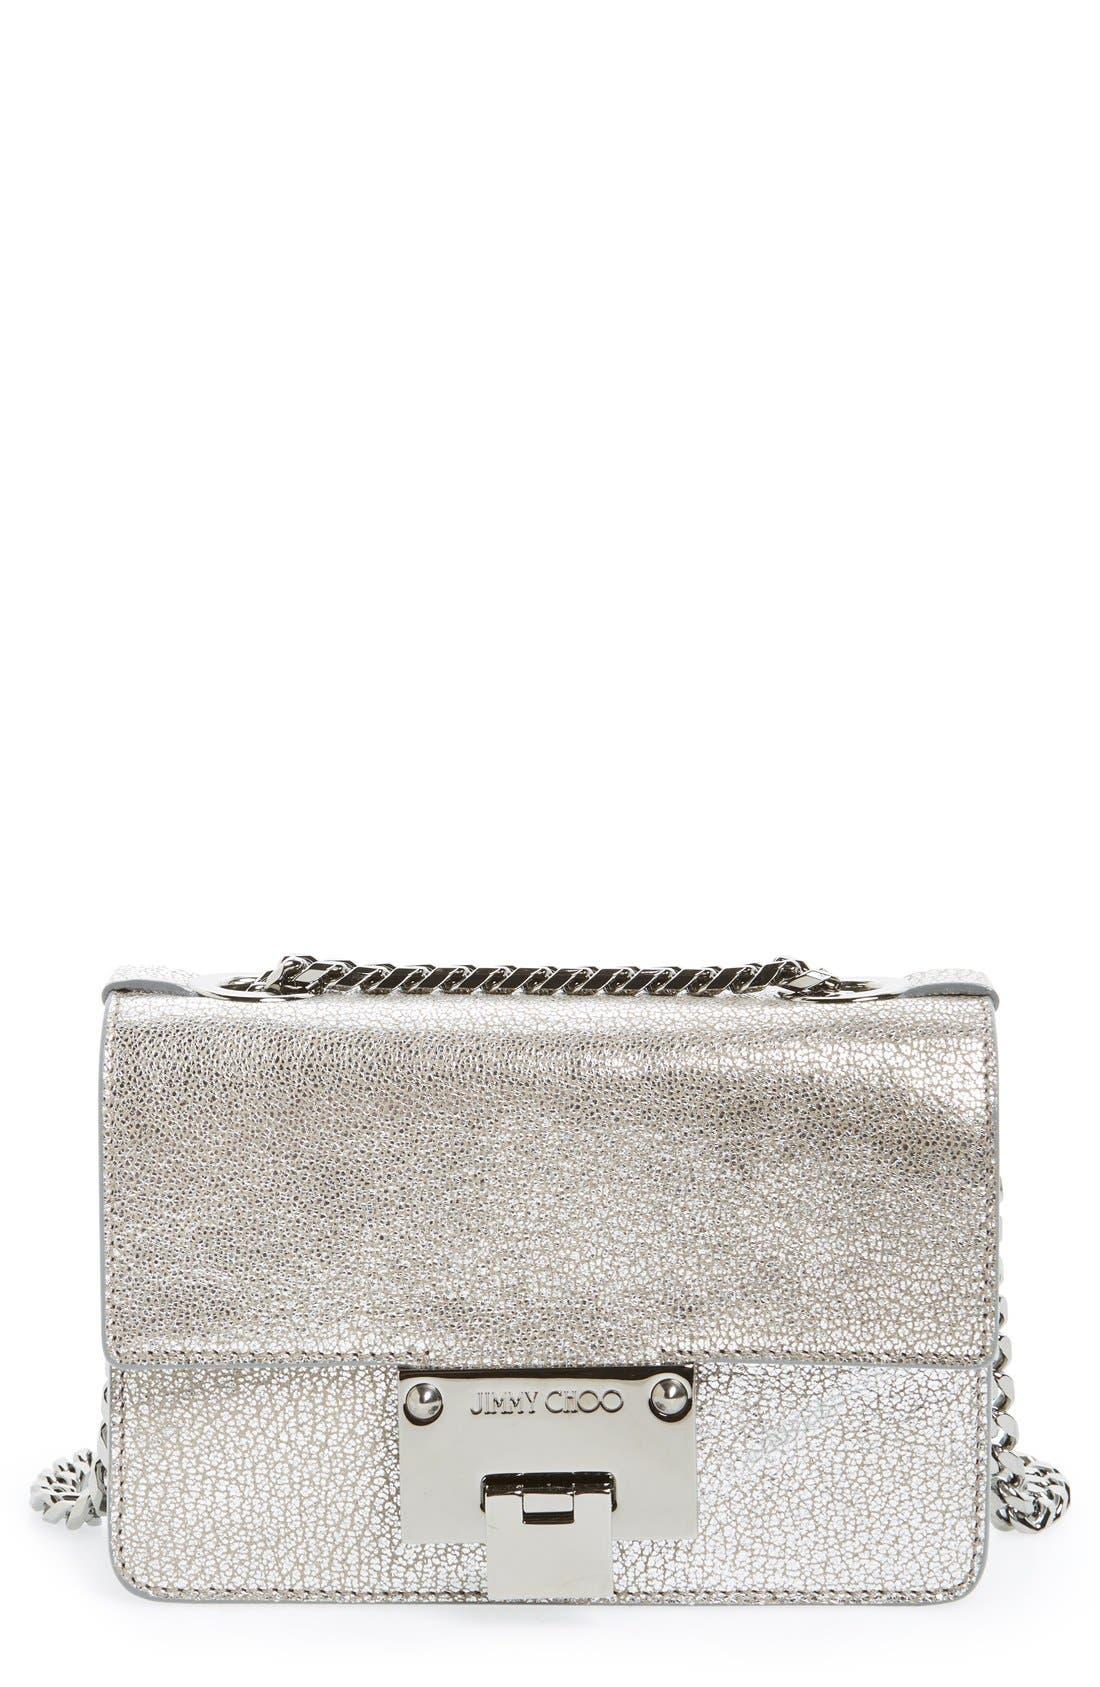 Rebel Mini Metallic Leather Crossbody Bag,                             Main thumbnail 1, color,                             040